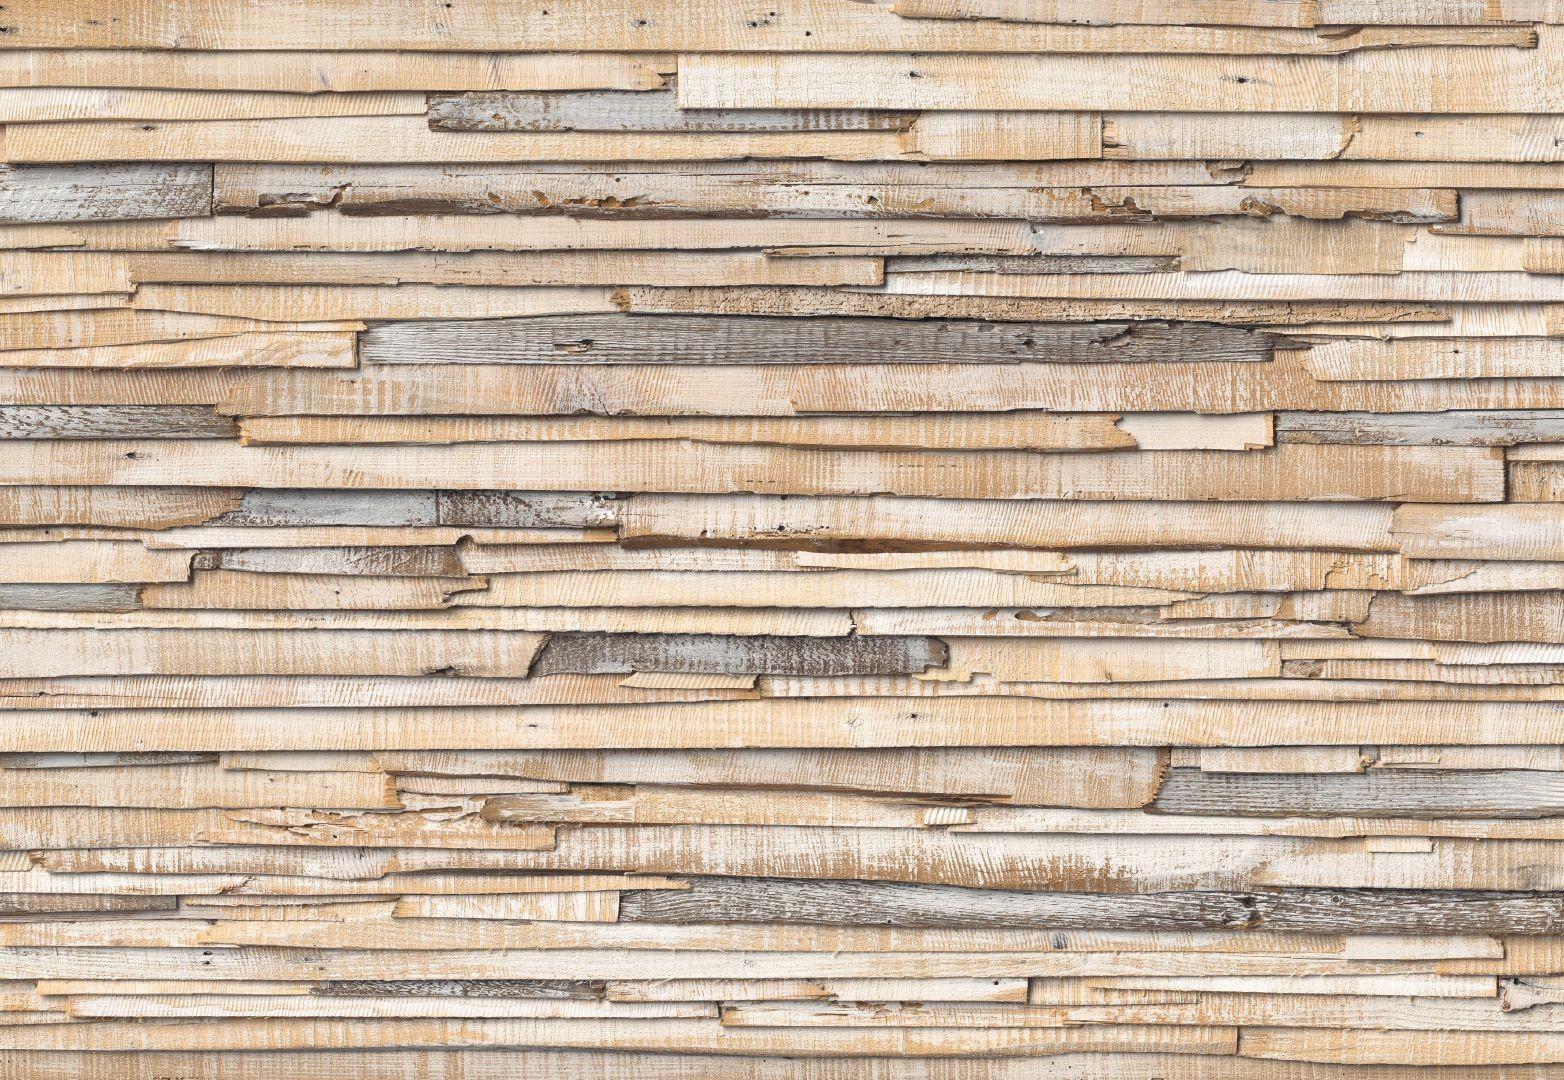 Fotobehang Whitewashed Wood Industrieel Behang Muurmode Nl